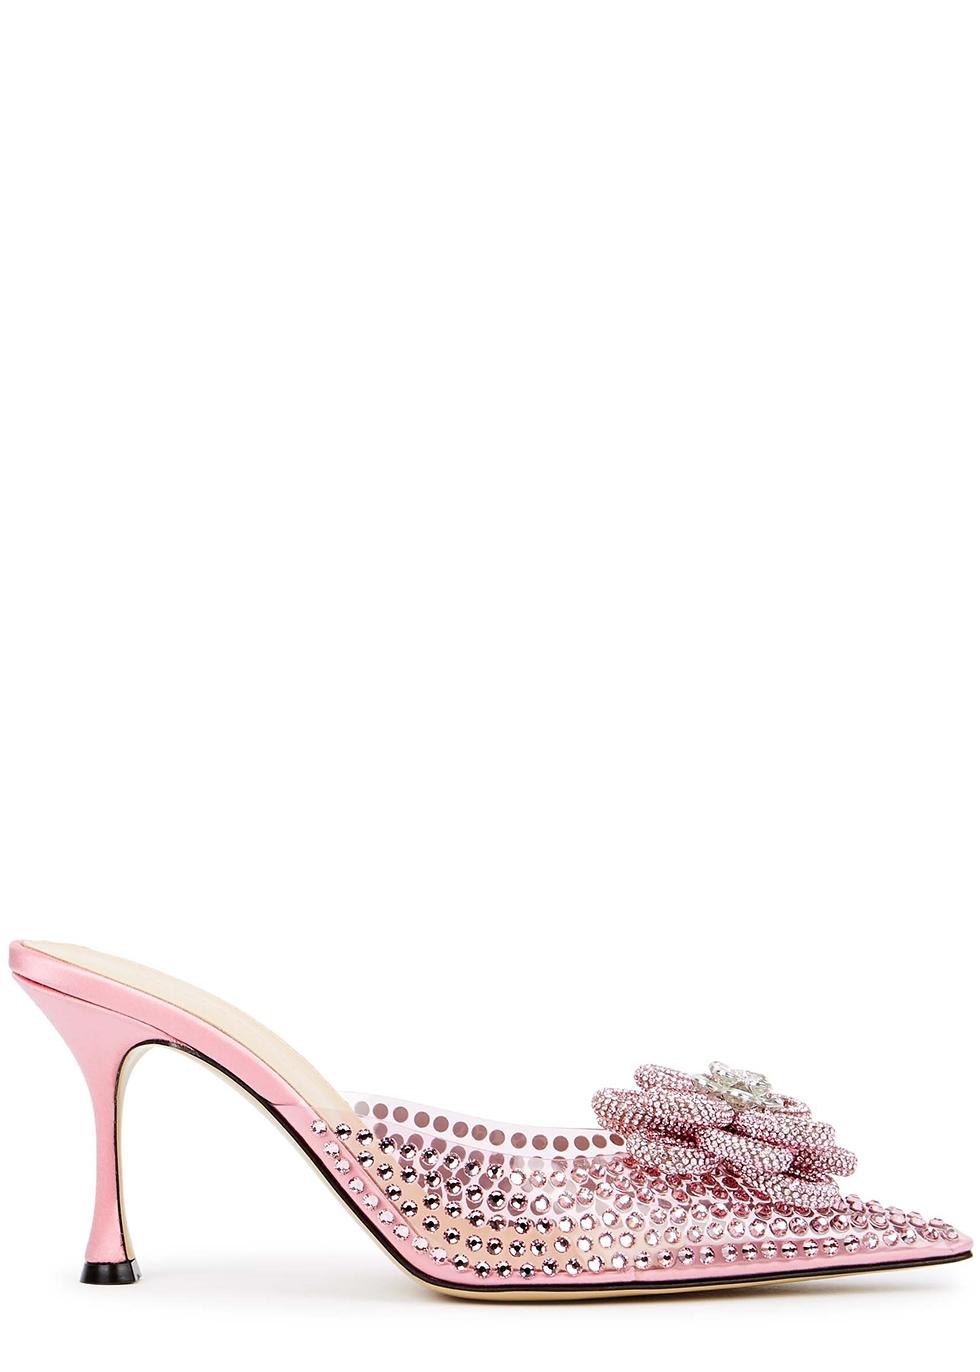 85 pink crystal-embellished PVC mules